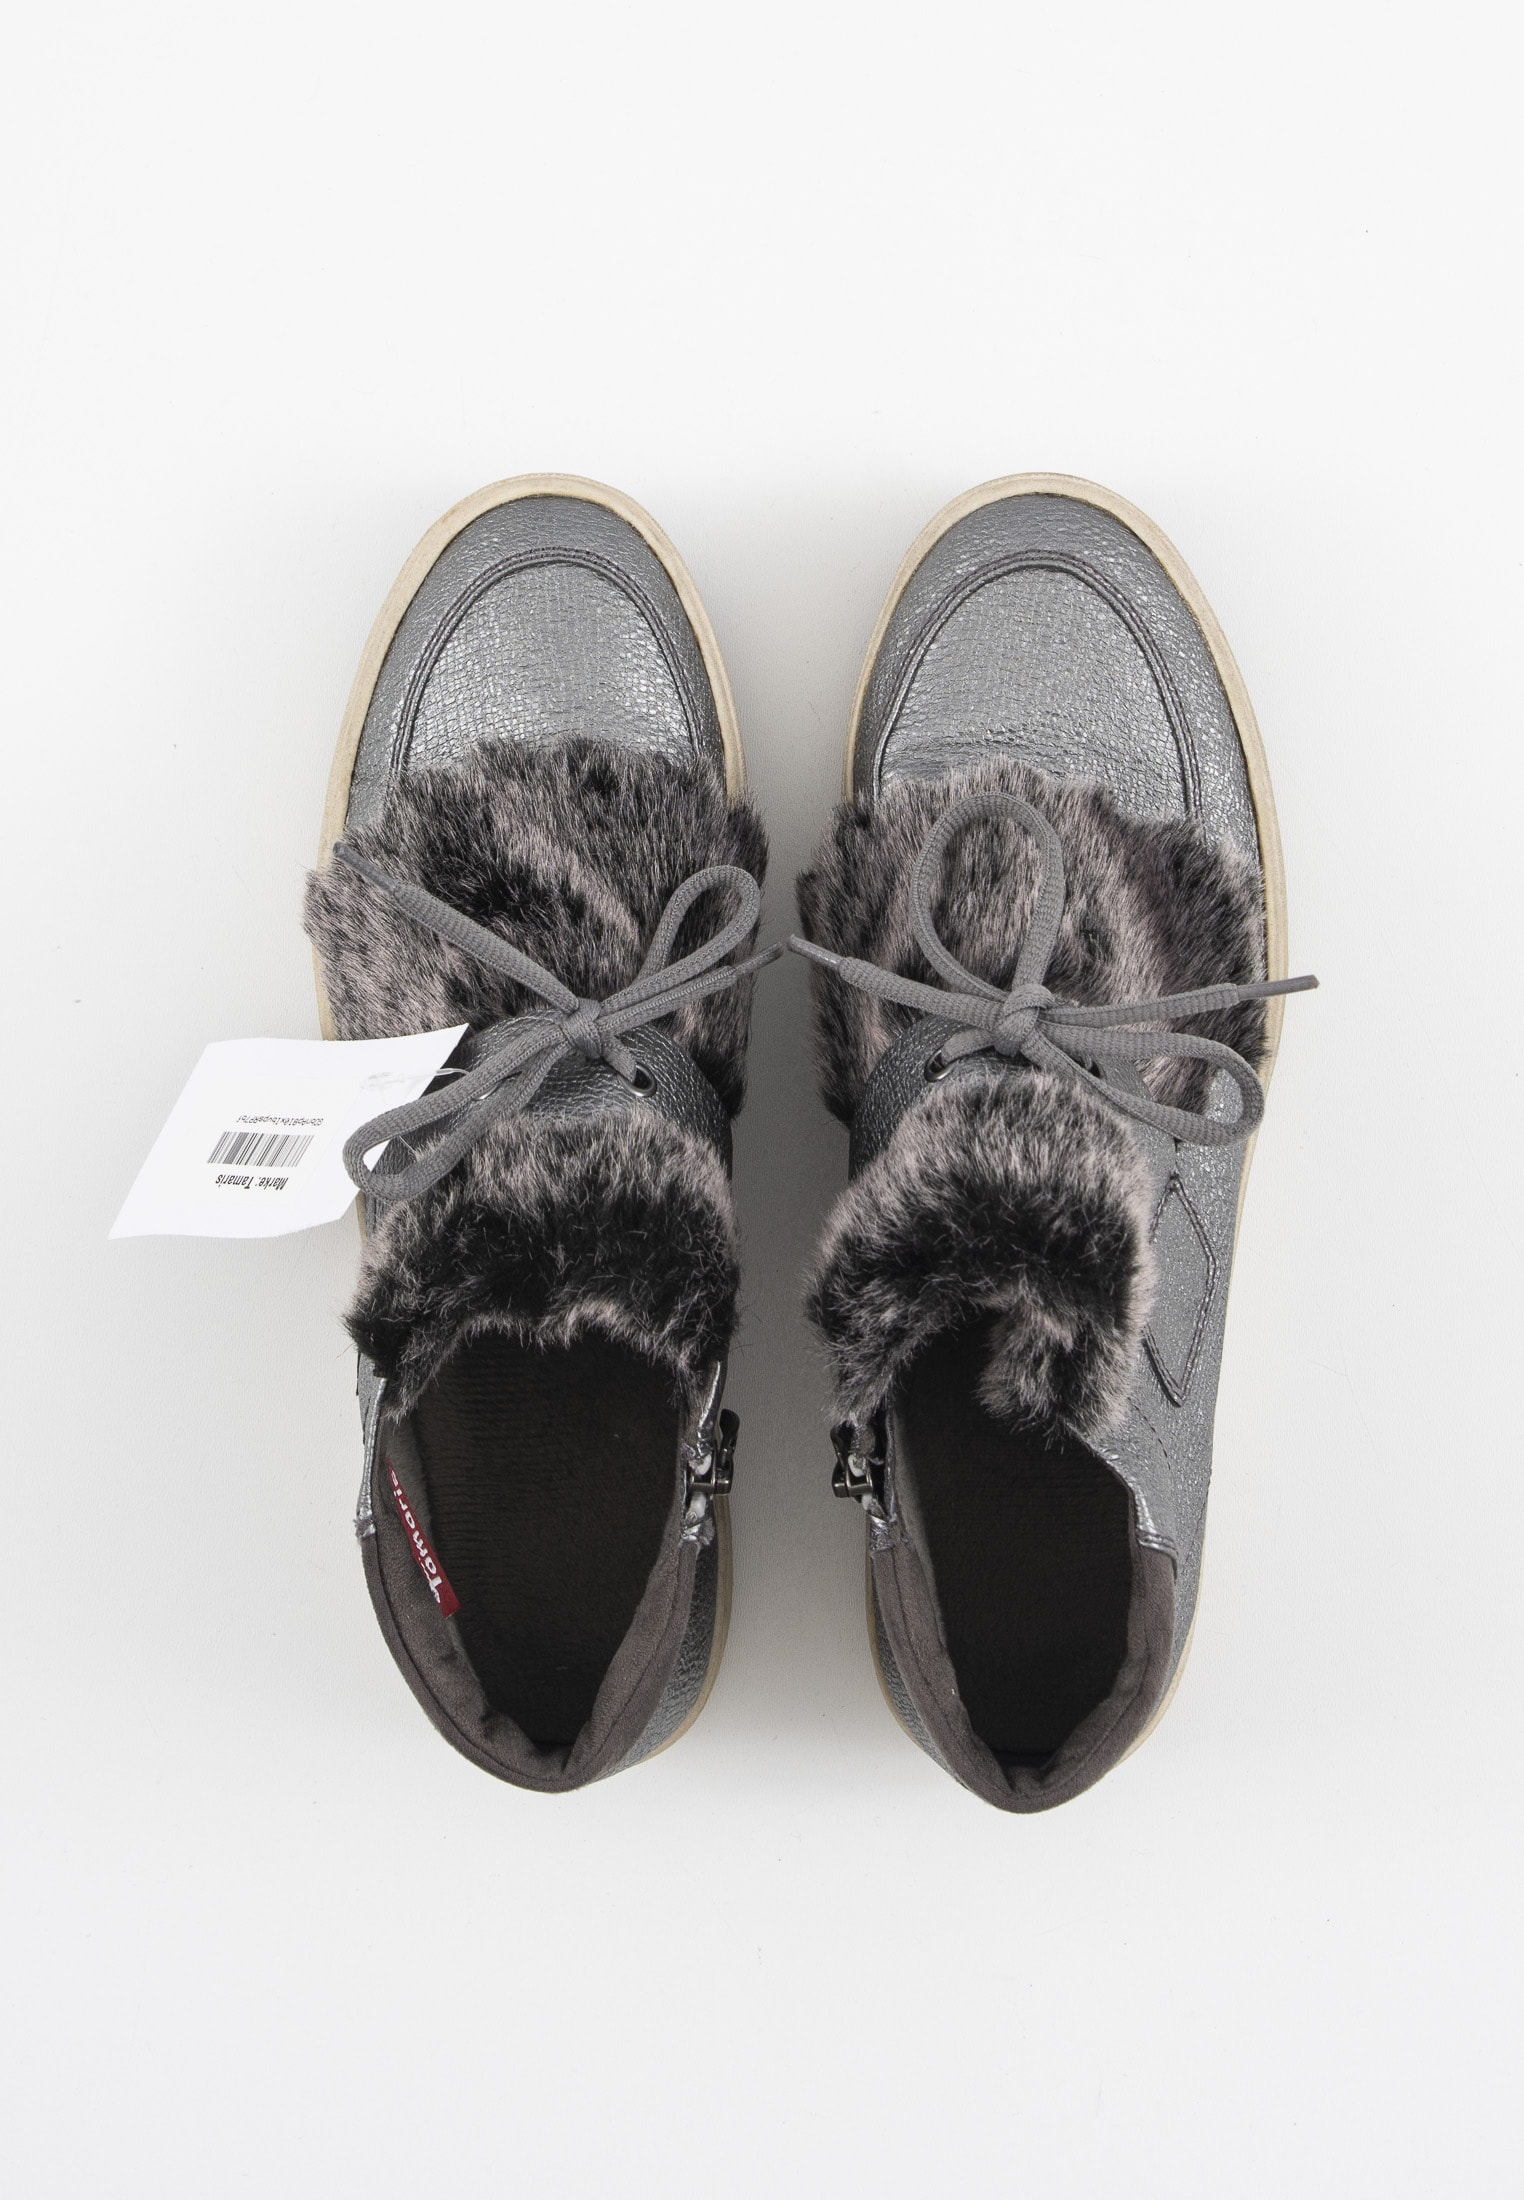 Tamaris Stiefel / Stiefelette / Boots Grau Gr.41